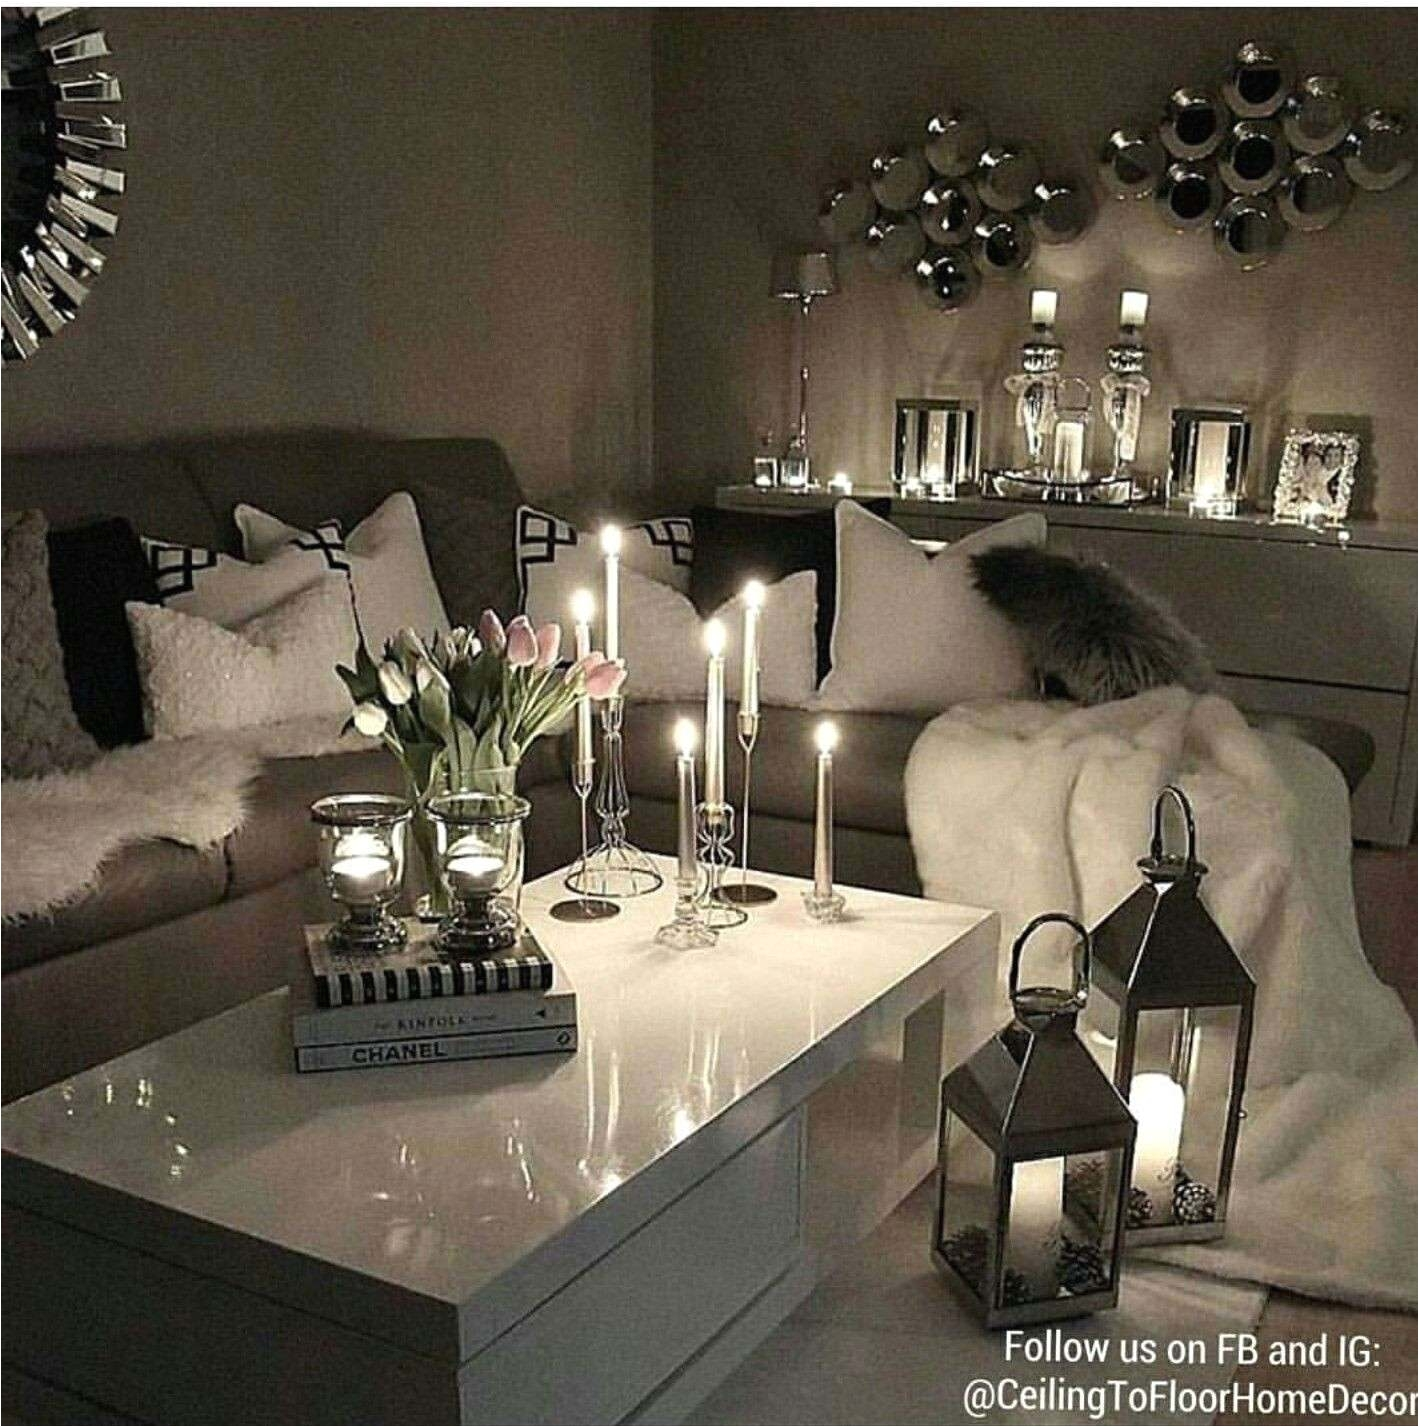 29 Easy Bedroom Ideas Loveable Home Decorating Shows Fresh sofa Fy sofa Fy sofa 0d'